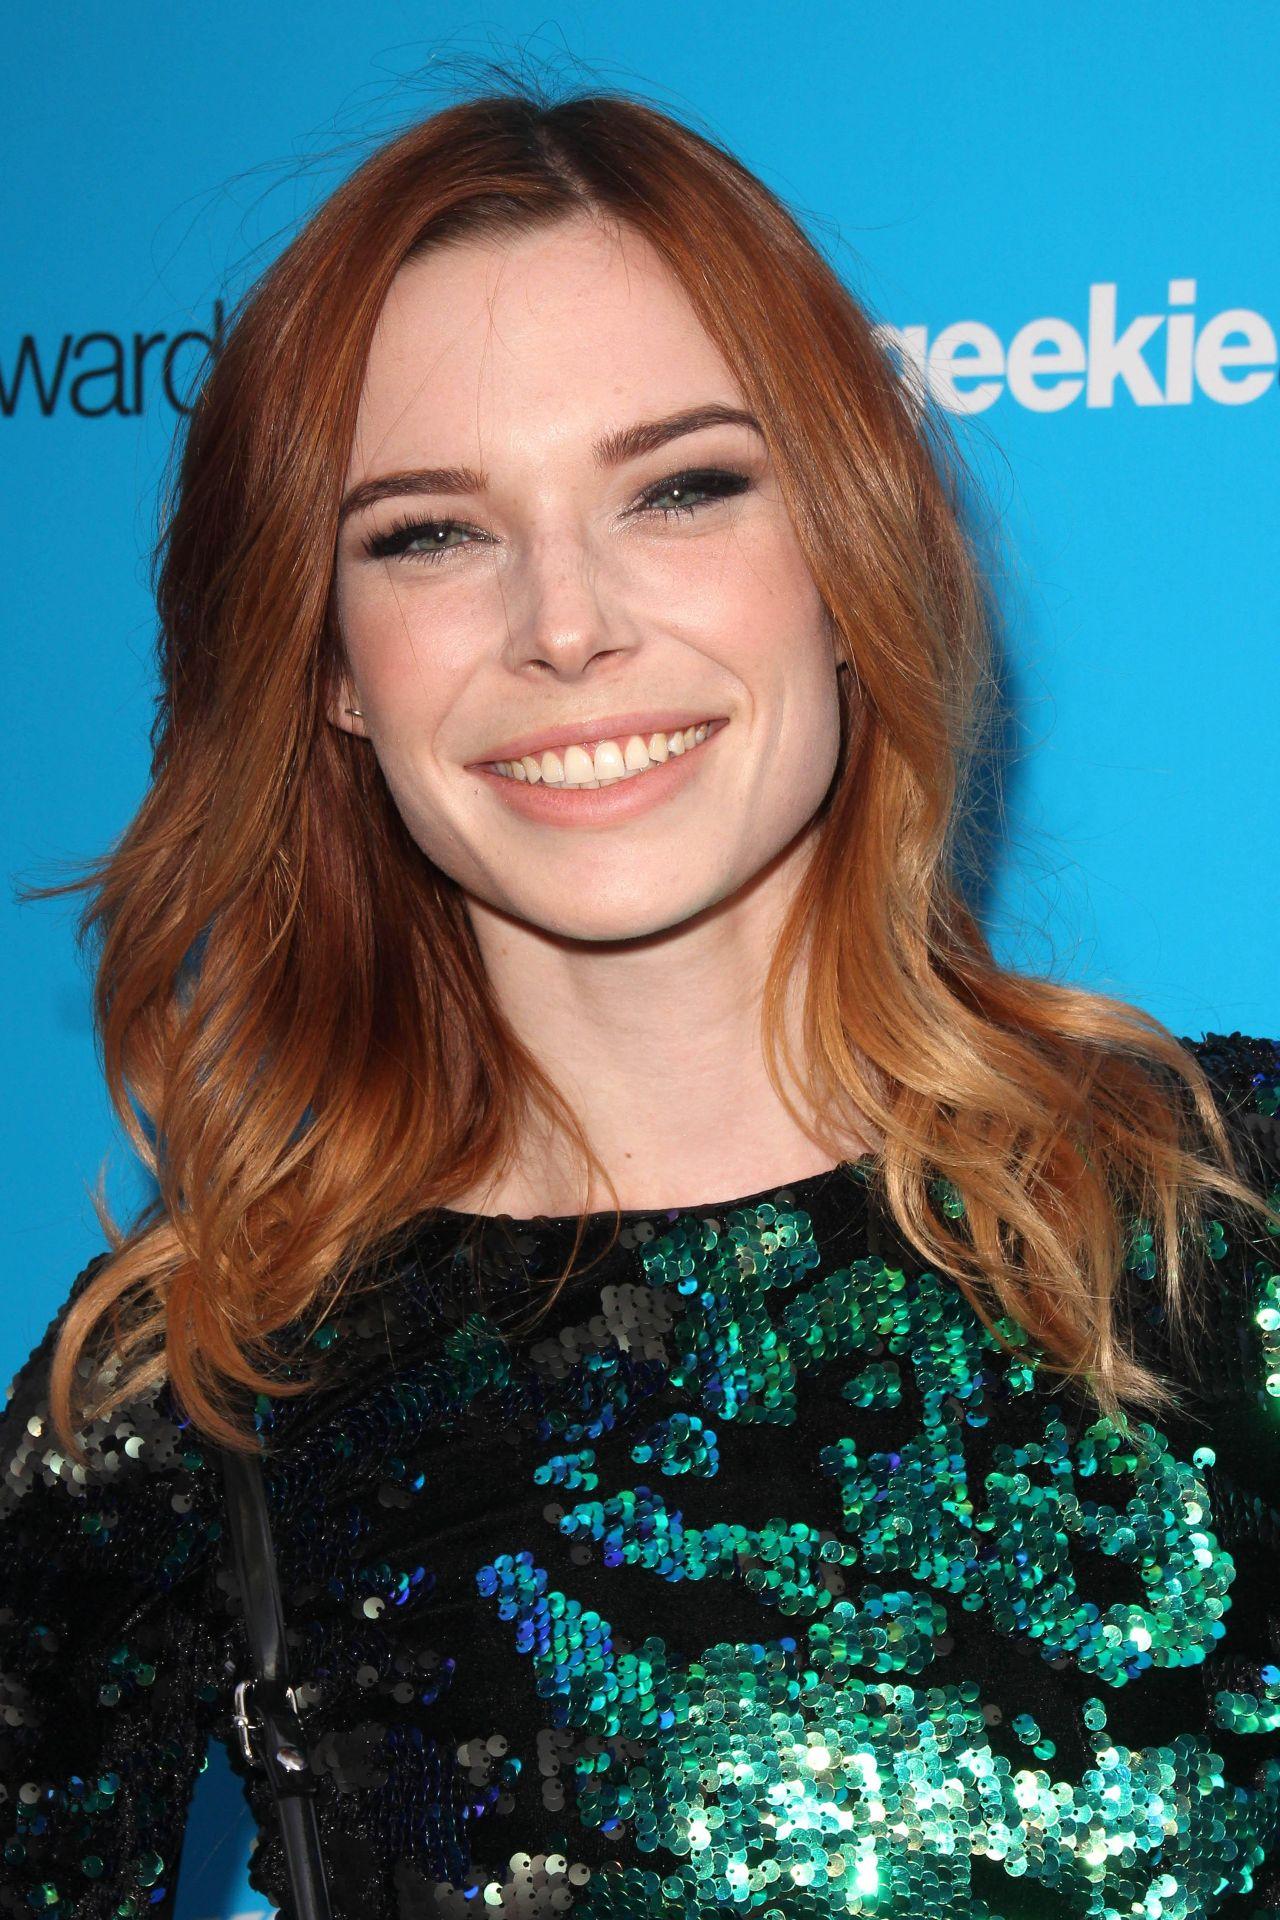 Chloe Dykstra 2015 Geekie Awards In Los Angeles